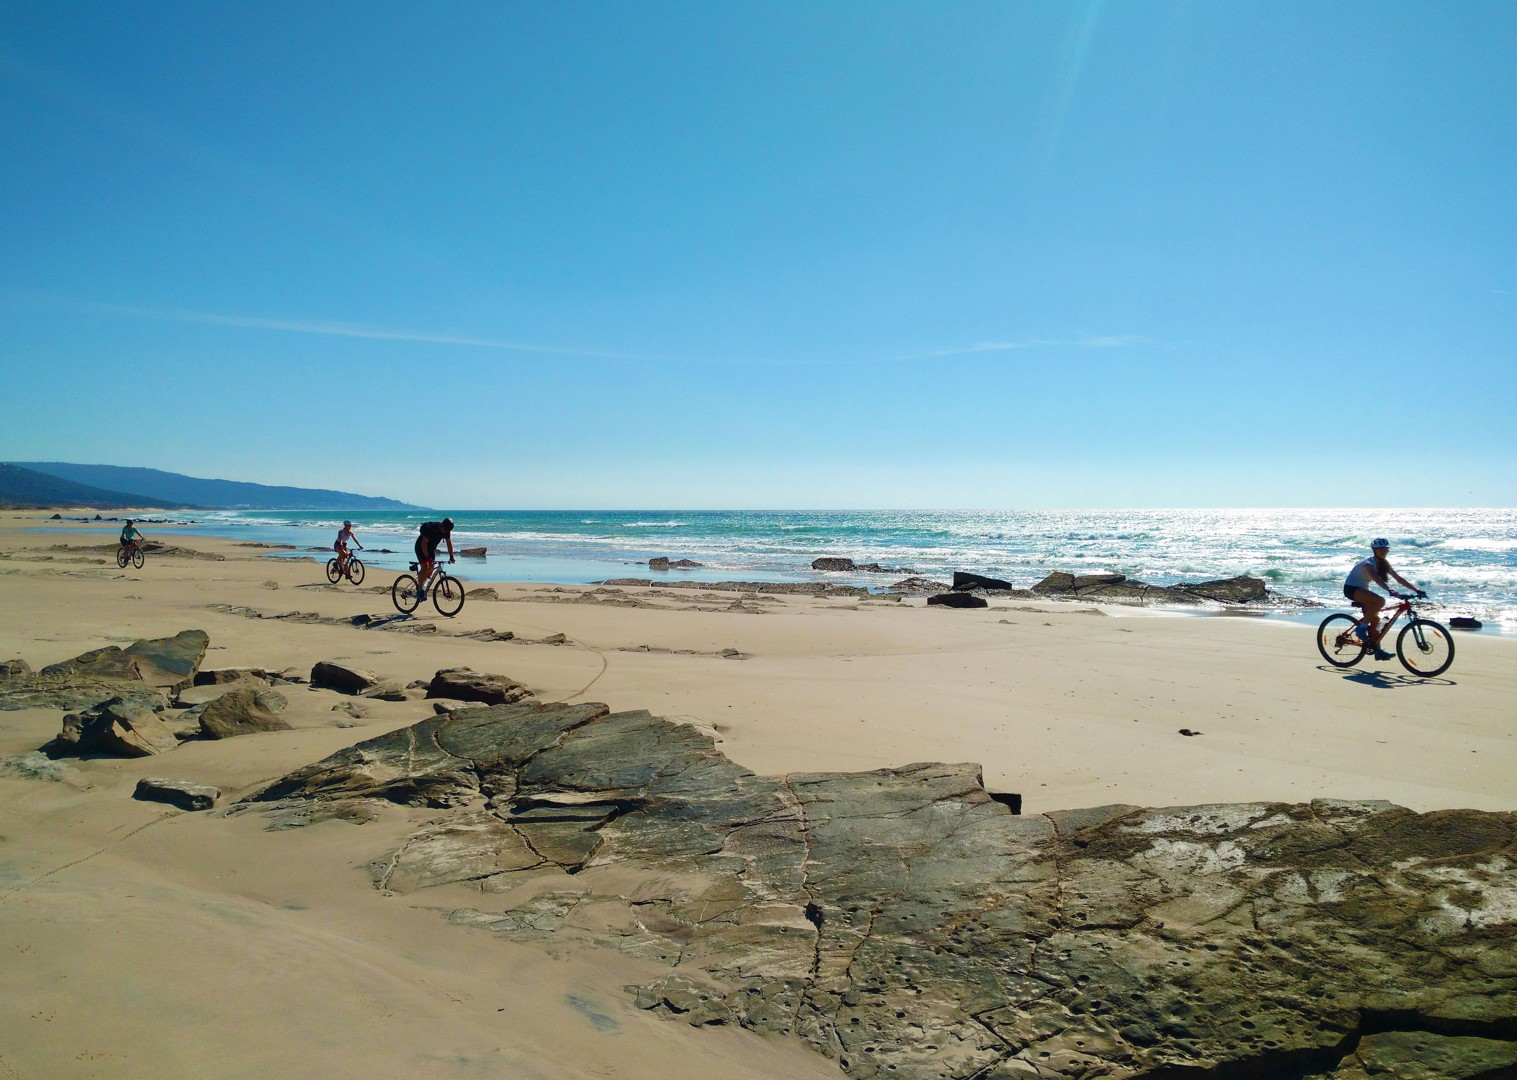 IMG_20171025_141322022.jpg - Southern Spain - Coastal Adventurer - Family Cycling